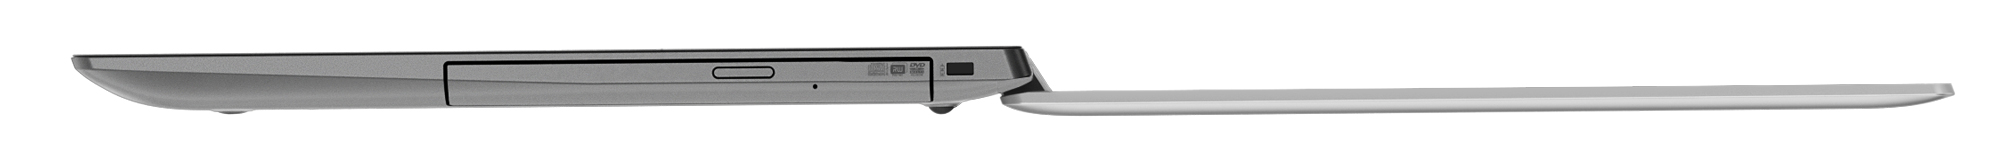 Фото  Ноутбук Lenovo ideapad 330-15 Platinum Grey (81DC00R8RA)